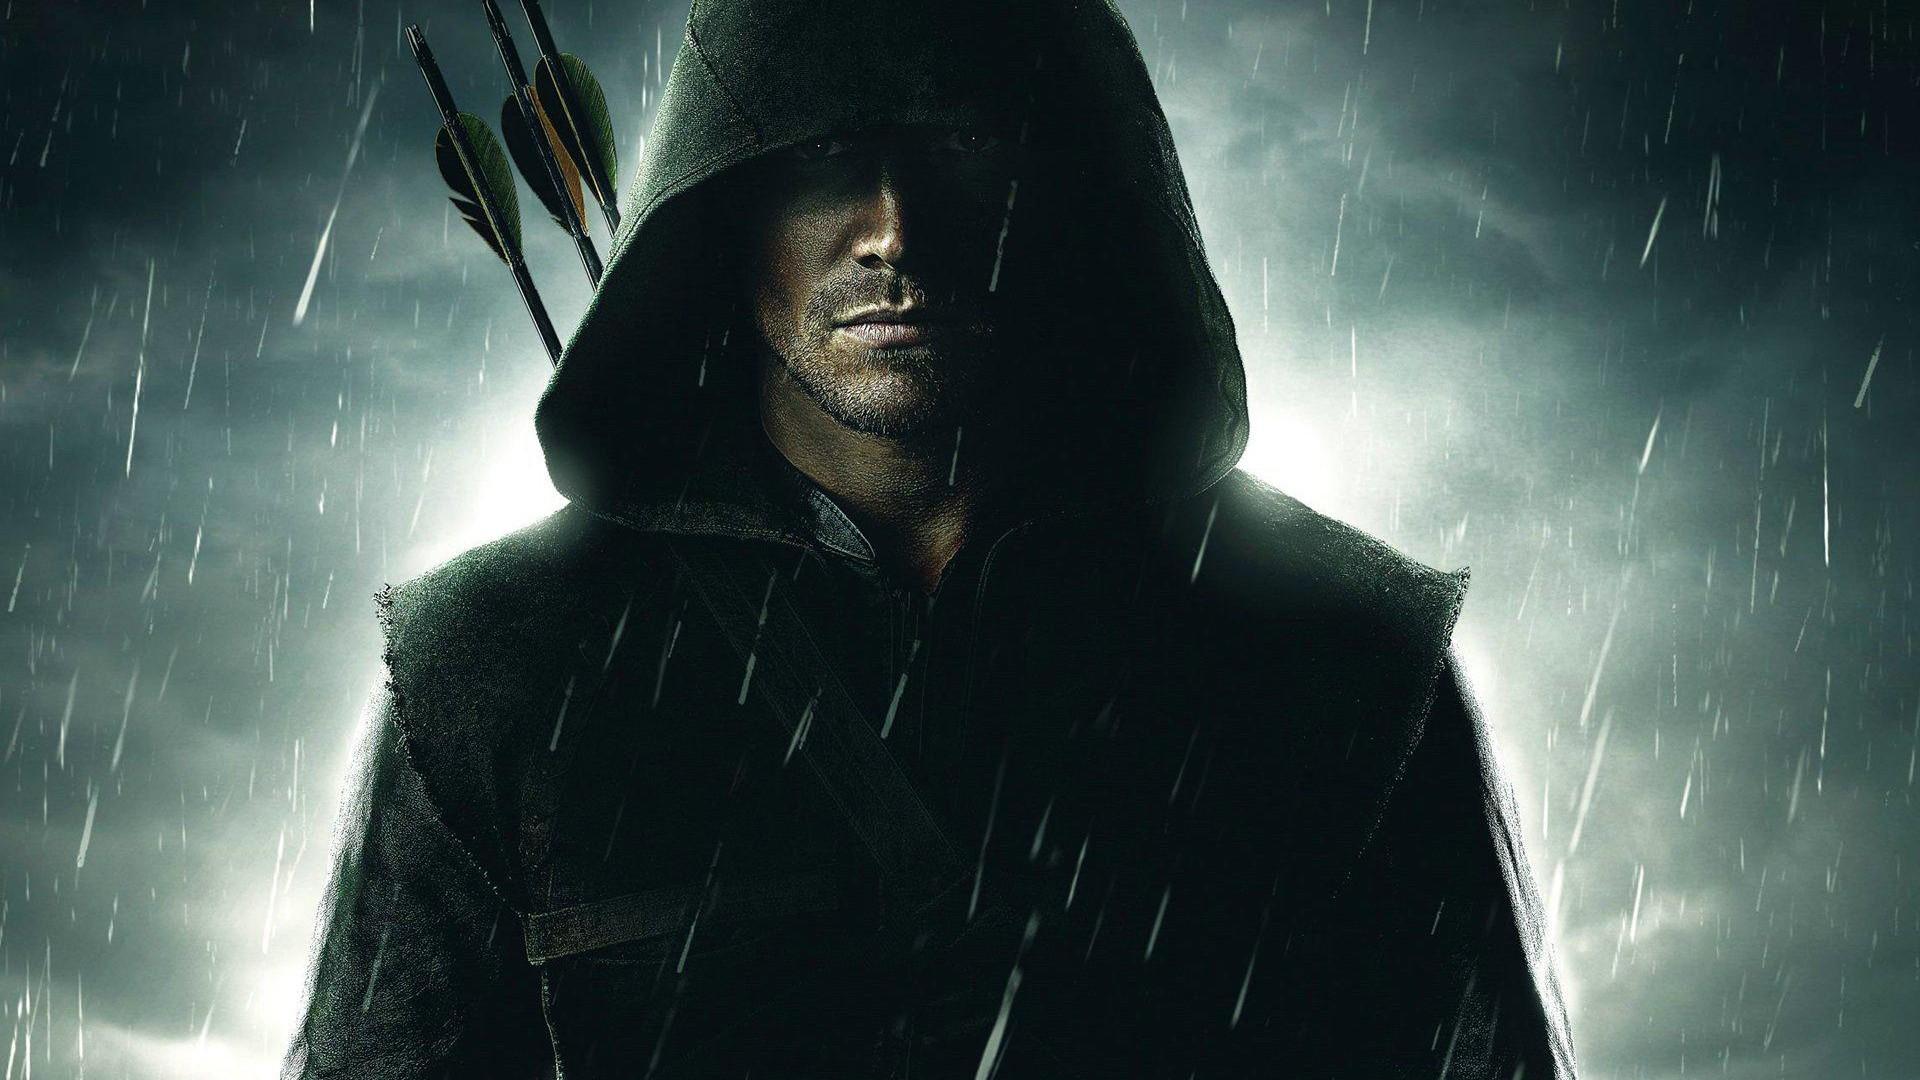 Green Arrow Action Hero Wallpaper HD Wallpaper …